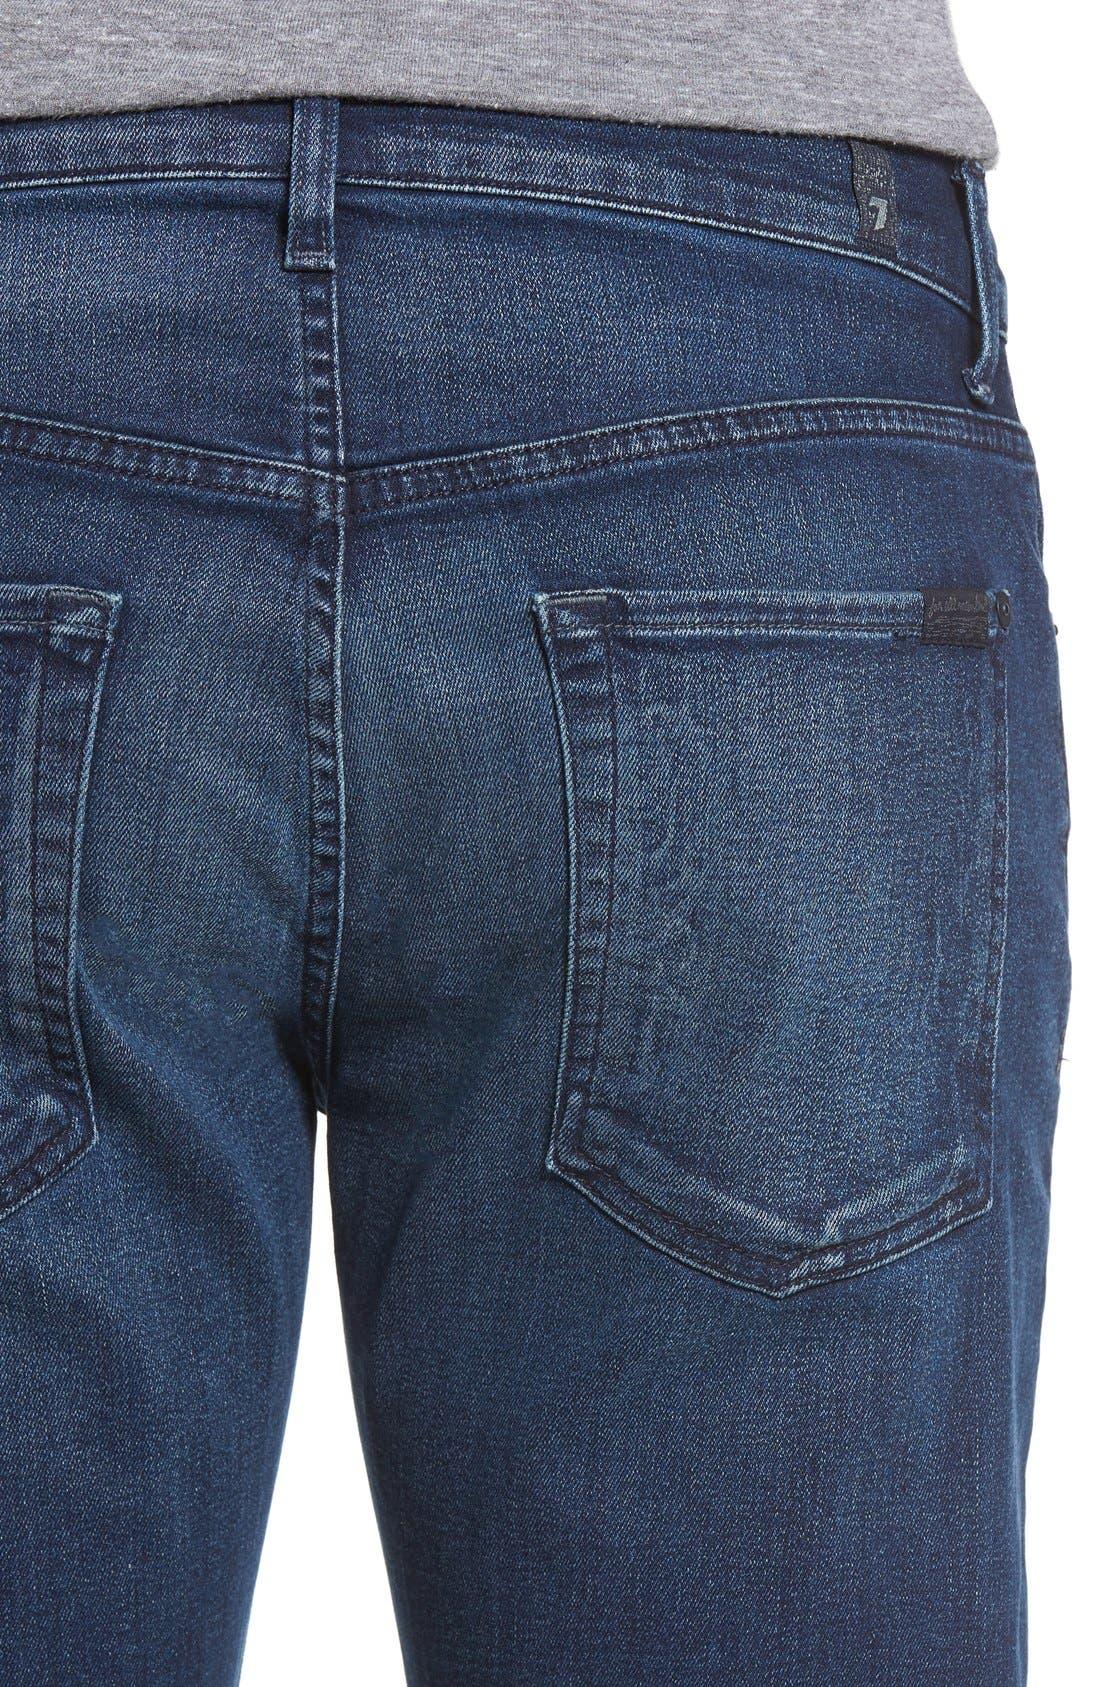 Slimmy Luxe Performance Slim Fit Jeans,                             Alternate thumbnail 4, color,                             Belfast